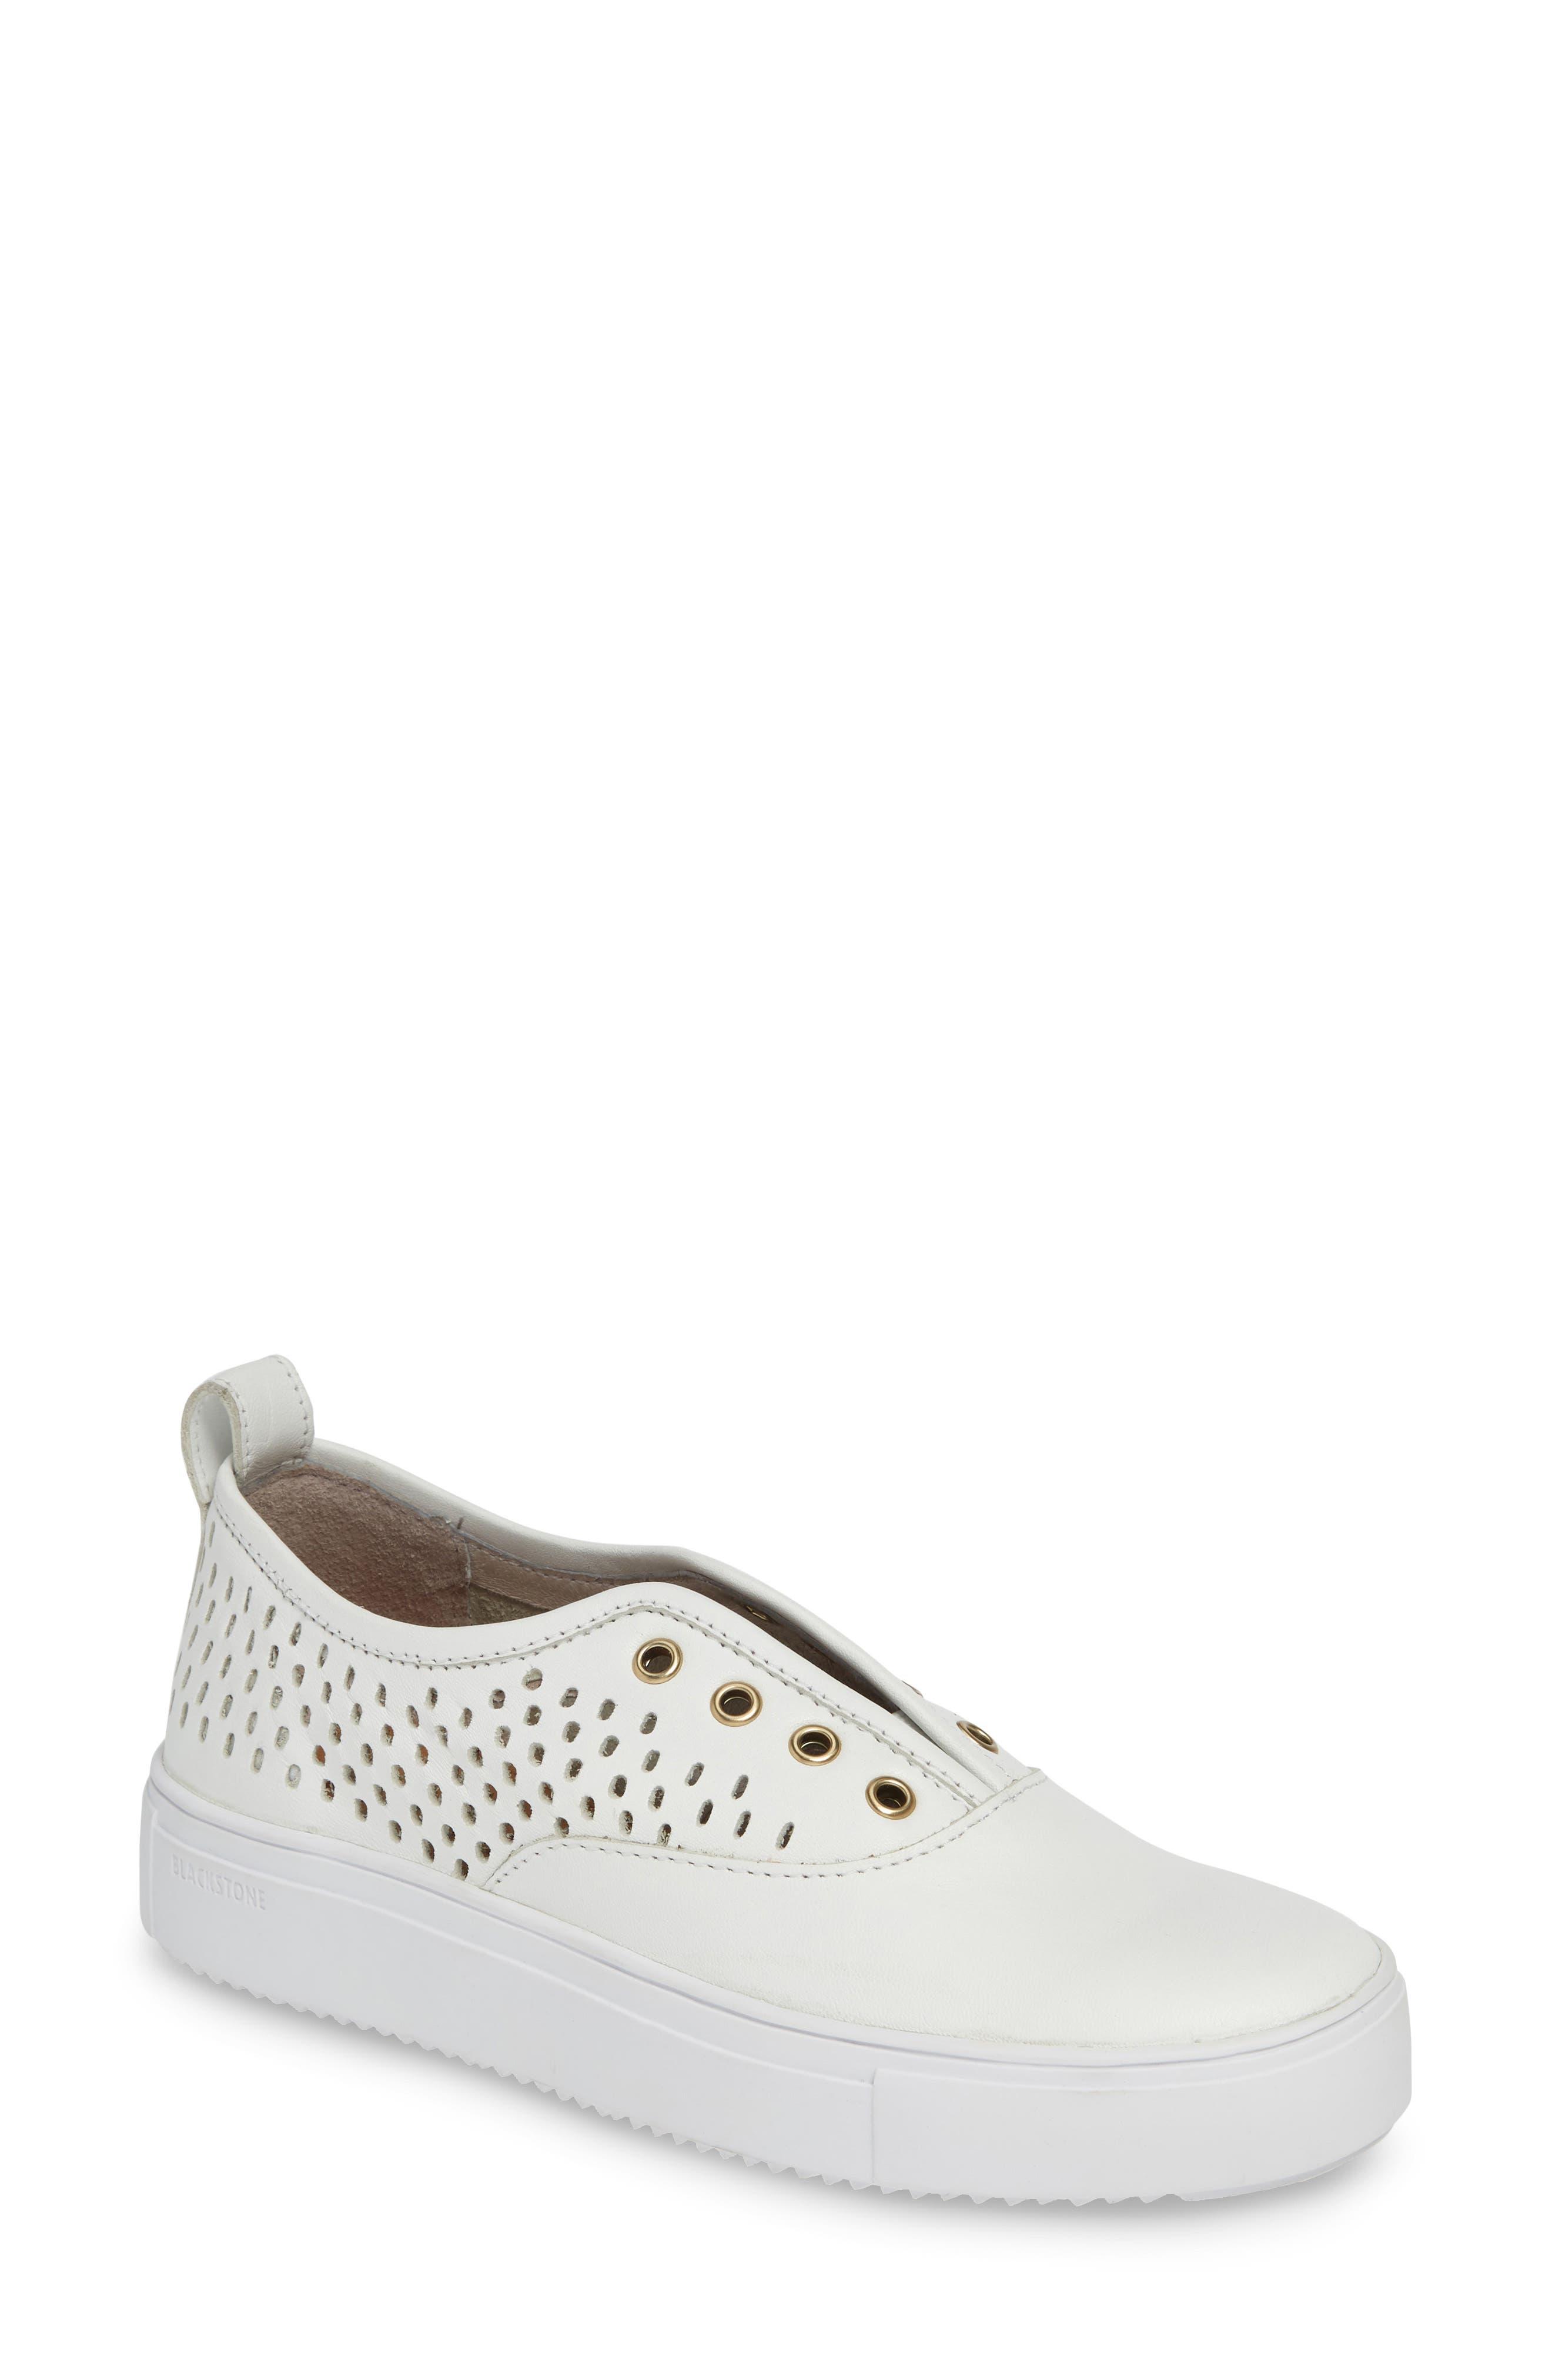 Blackstone Rl67 Laceless Perforated Sneaker, White